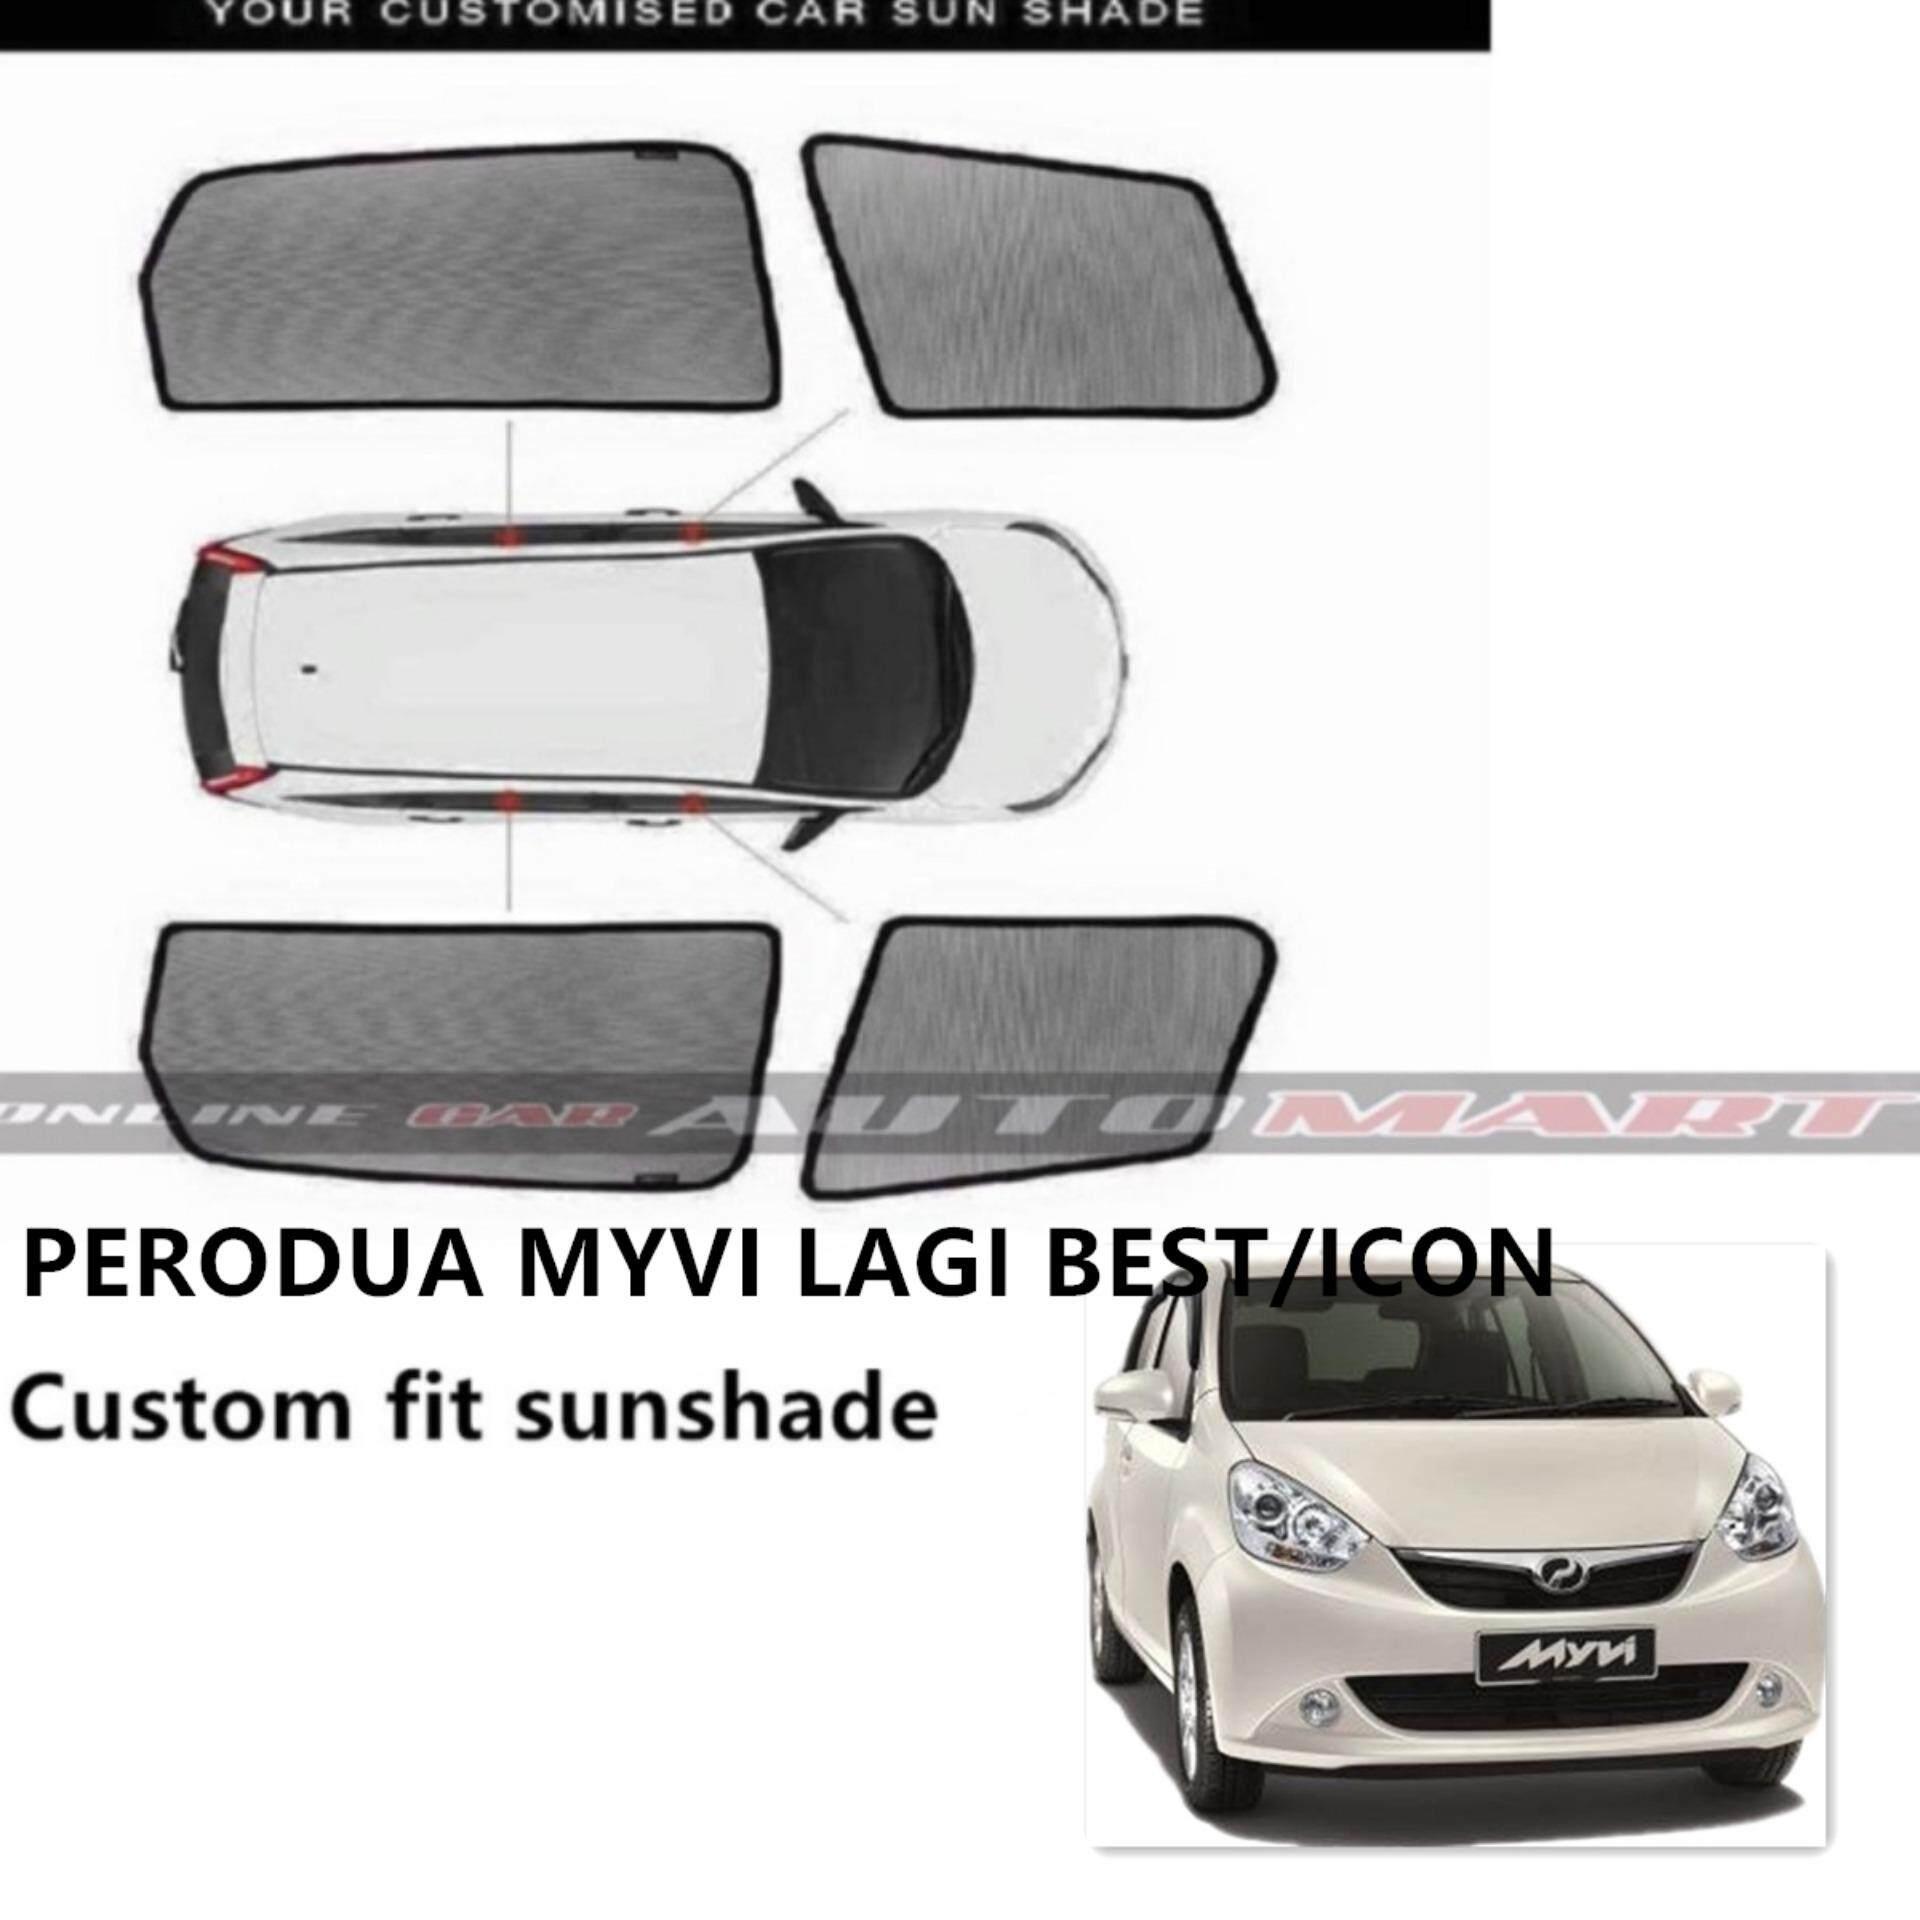 Custom Fit OEM Sunshades/ Sun Shades for MYVI Lagi Best & Icon - 4 Pcs